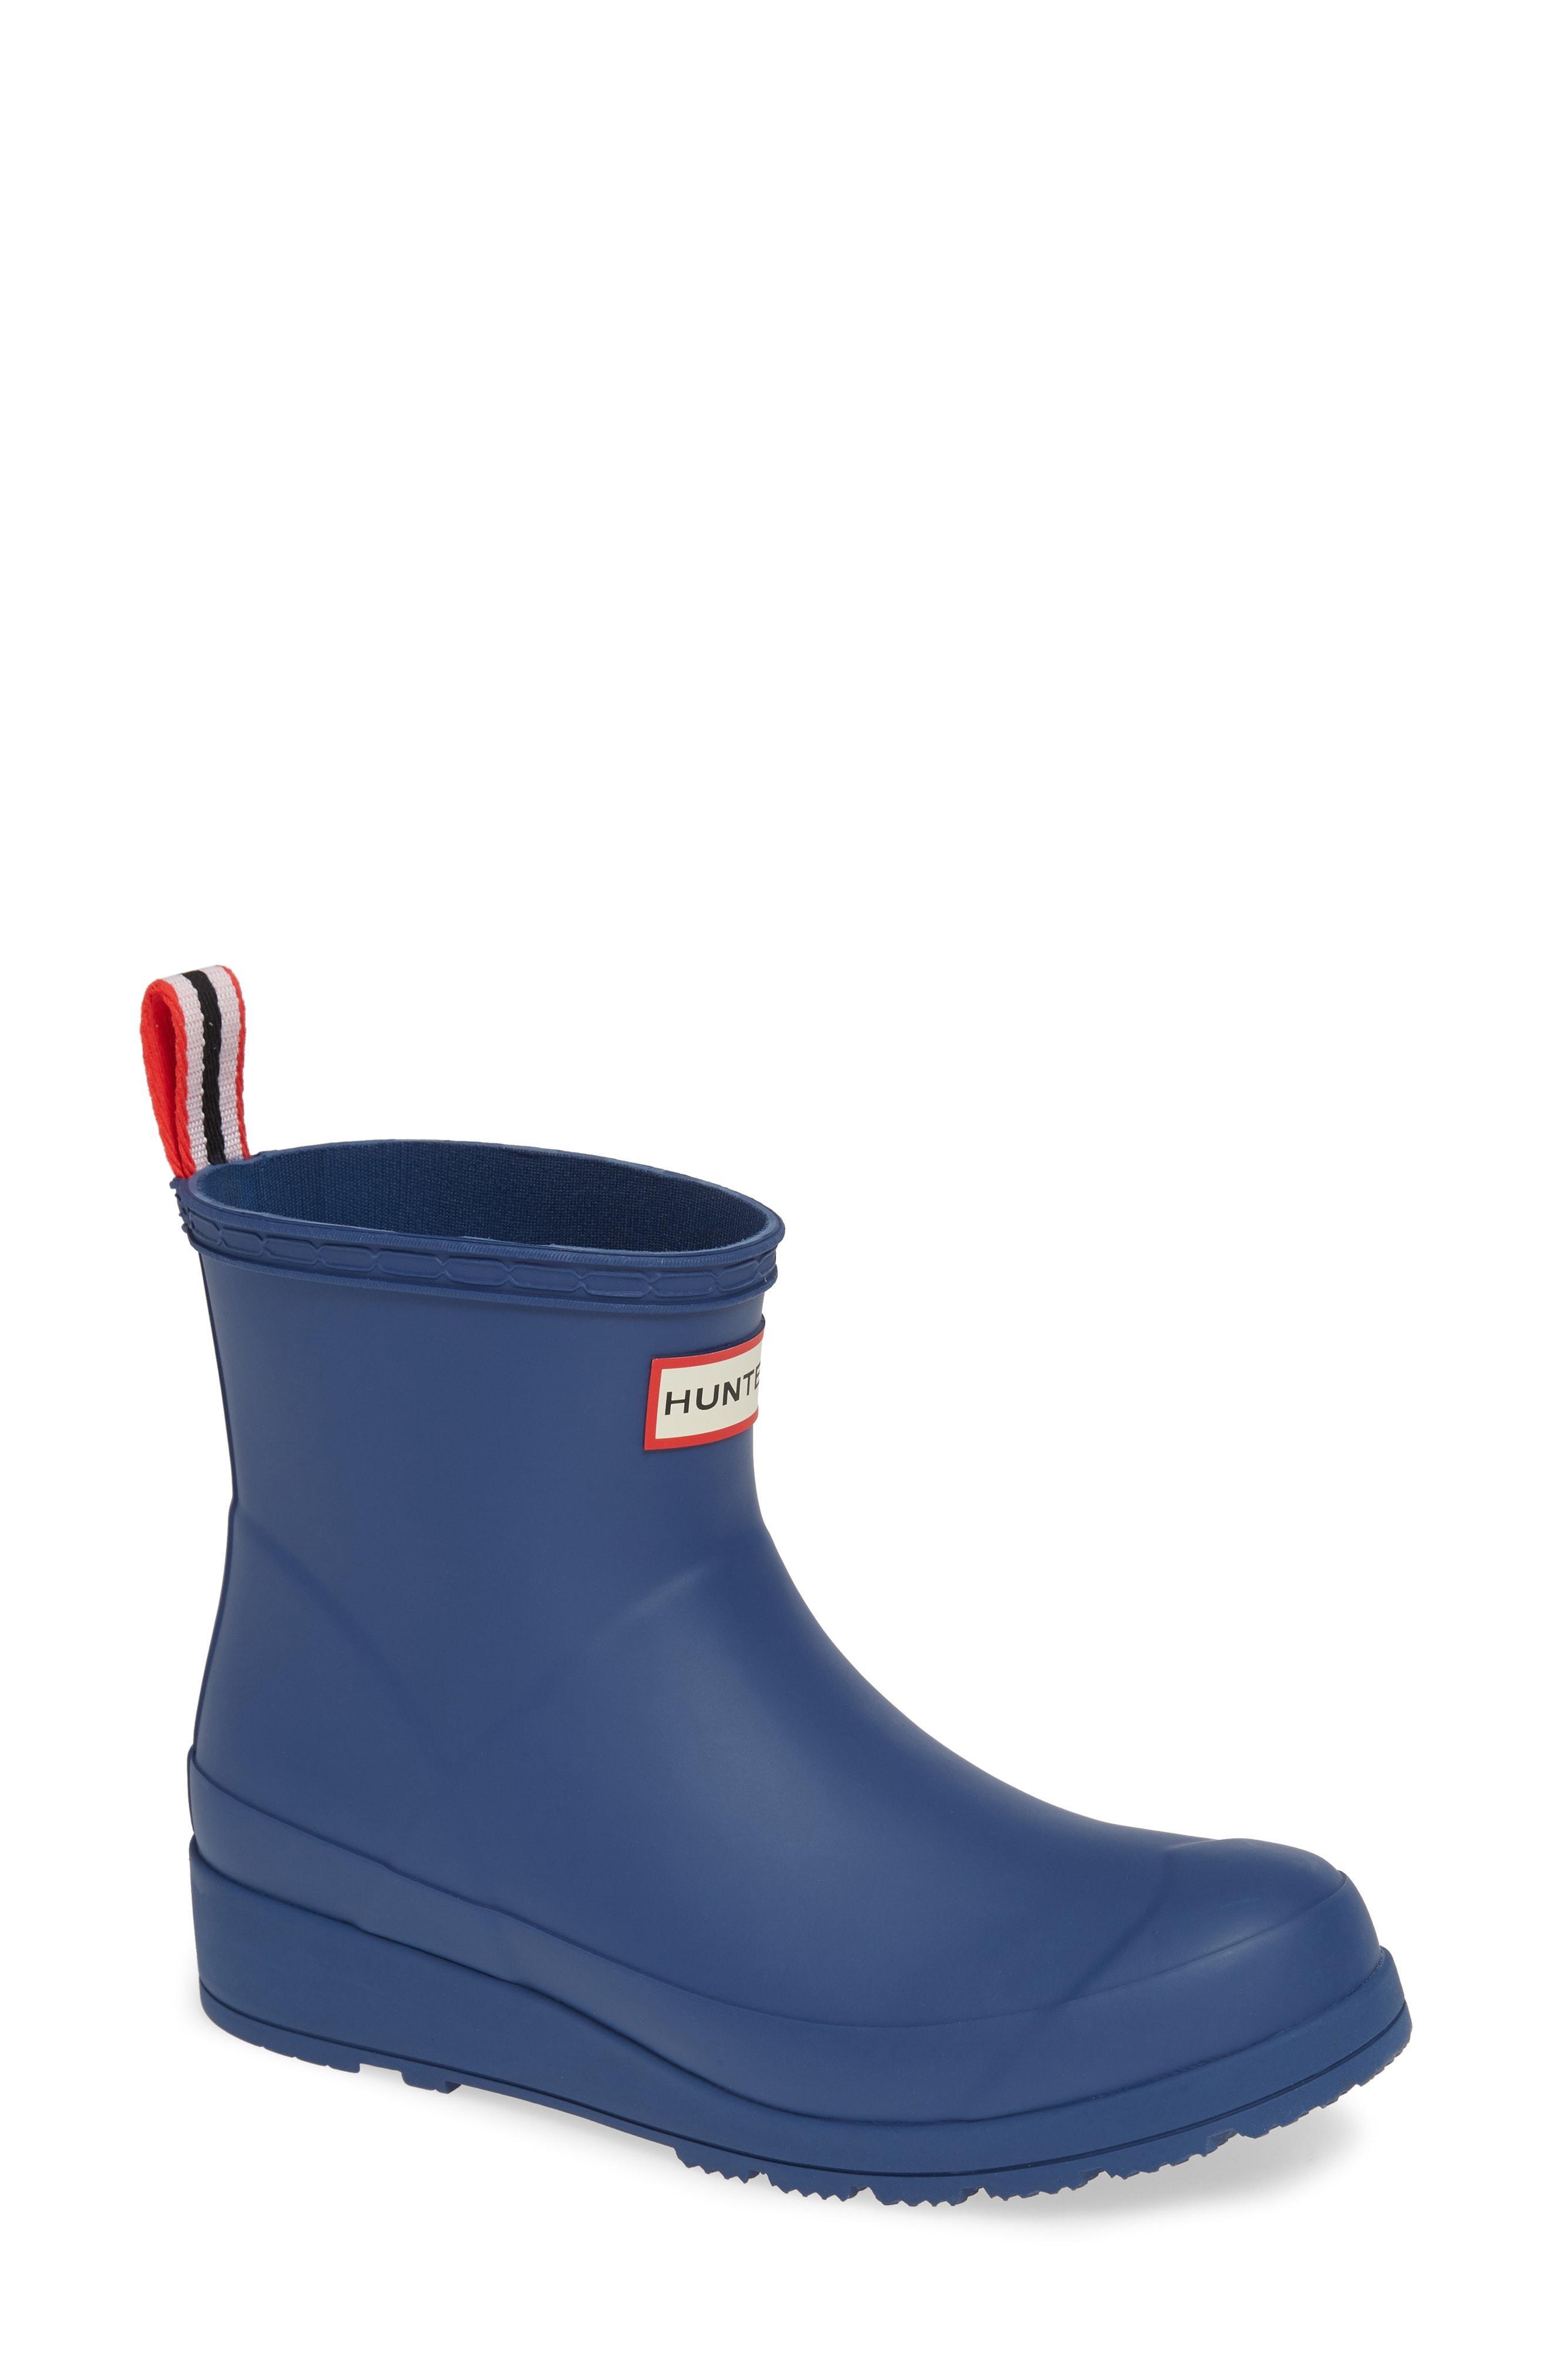 0d07e0c379b Lyst - Hunter Original Play Waterproof Rain Bootie in Blue